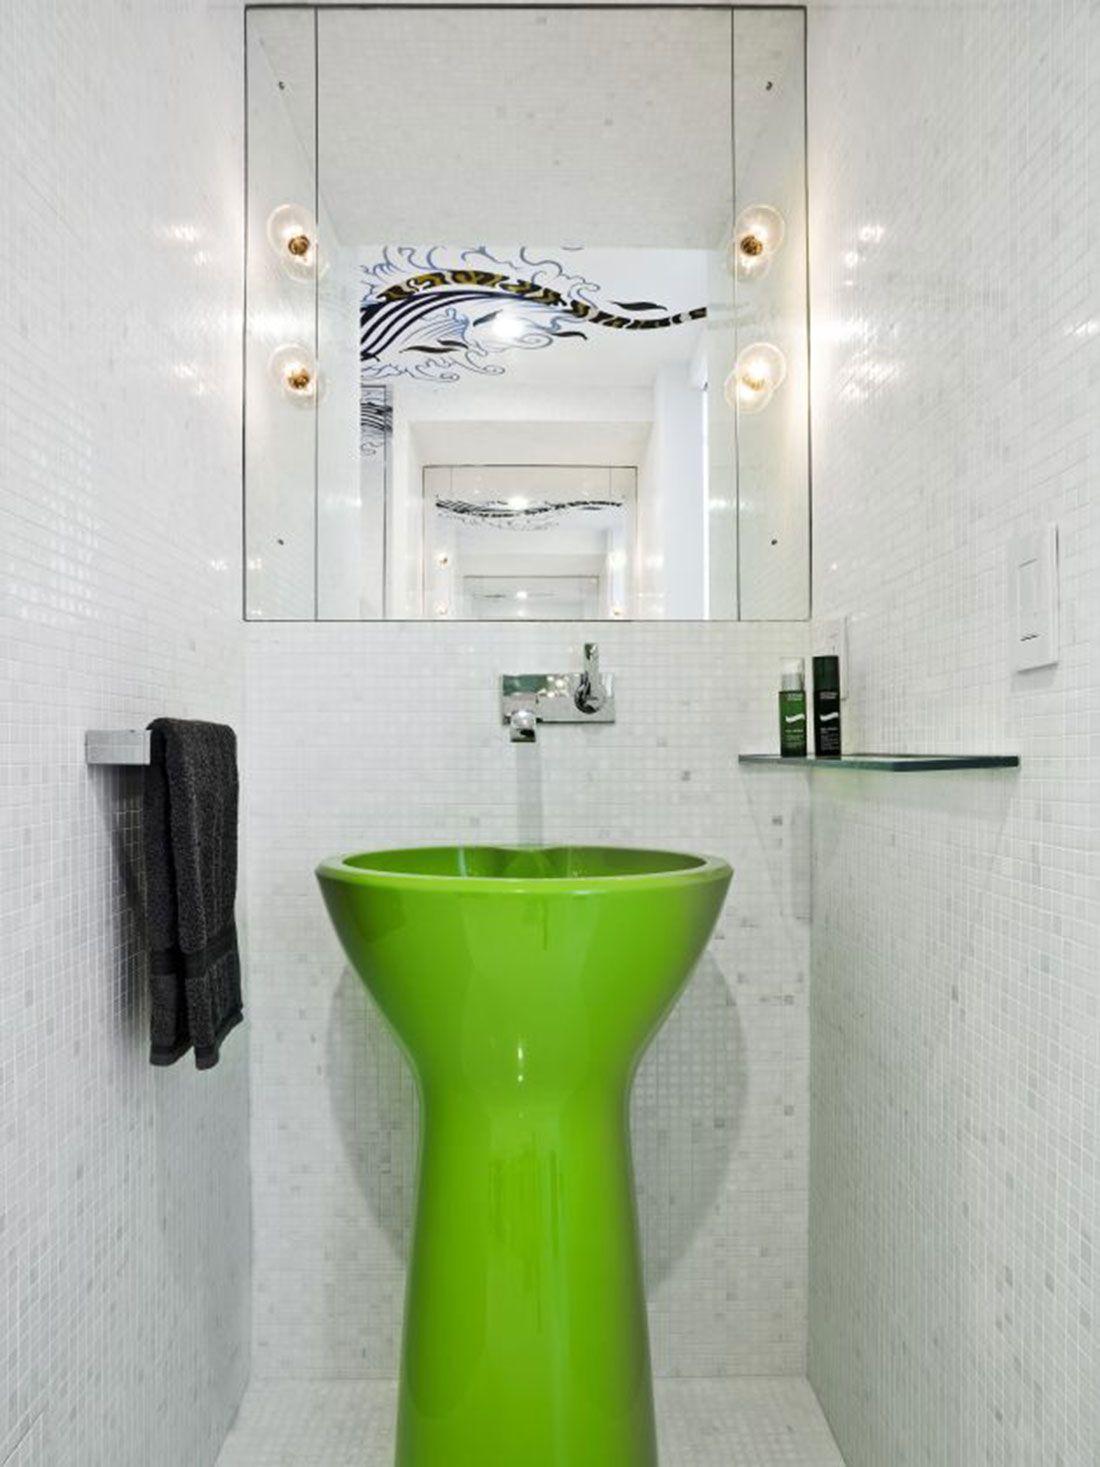 acid green | Bathrooms | Pinterest | Bathroom accessories, City ...